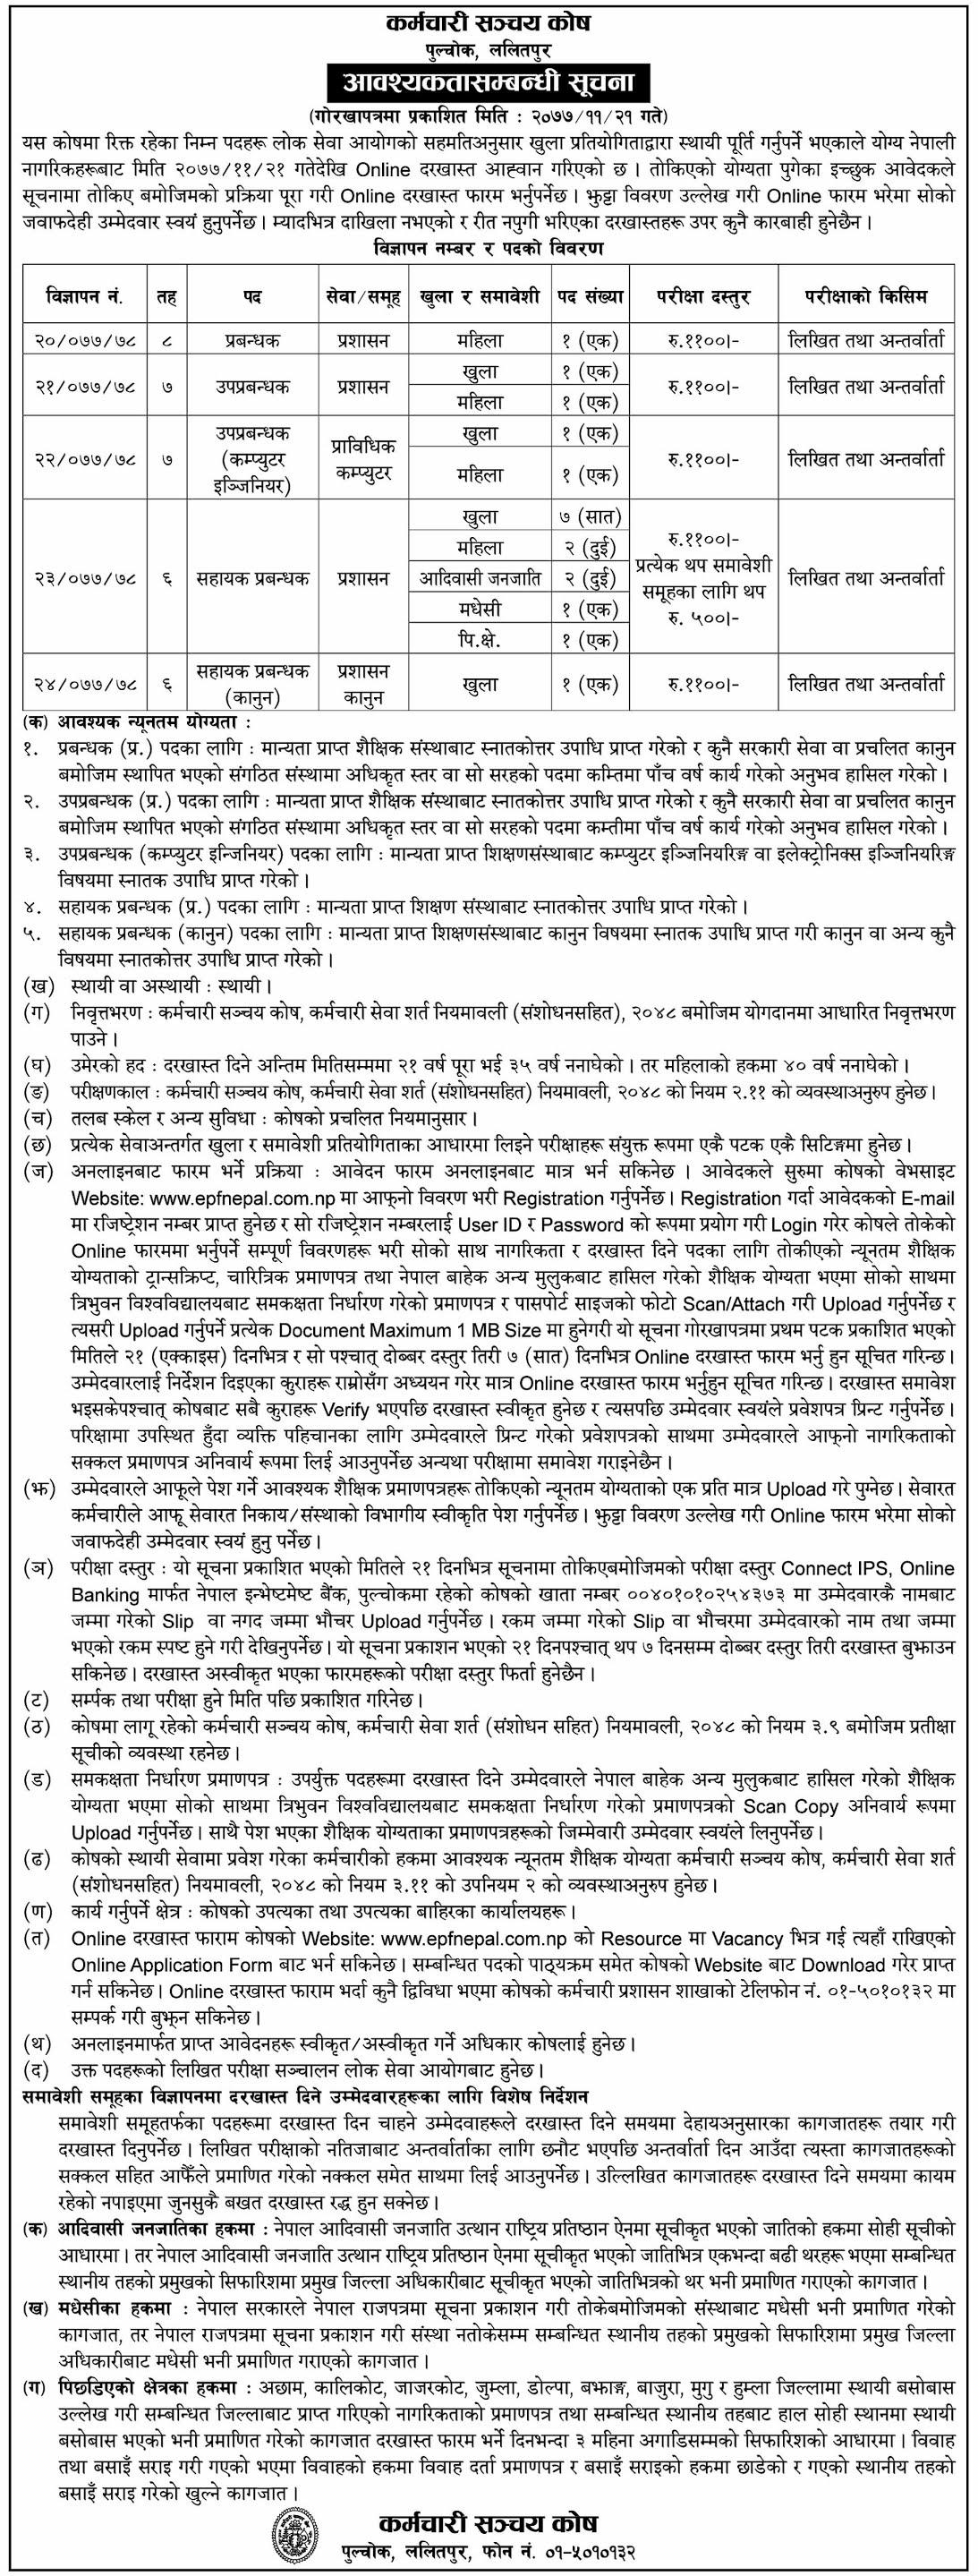 Karmachari Sanchay Kosh (EPF) Announced Vacancies For Various Post of Level 6 To 8